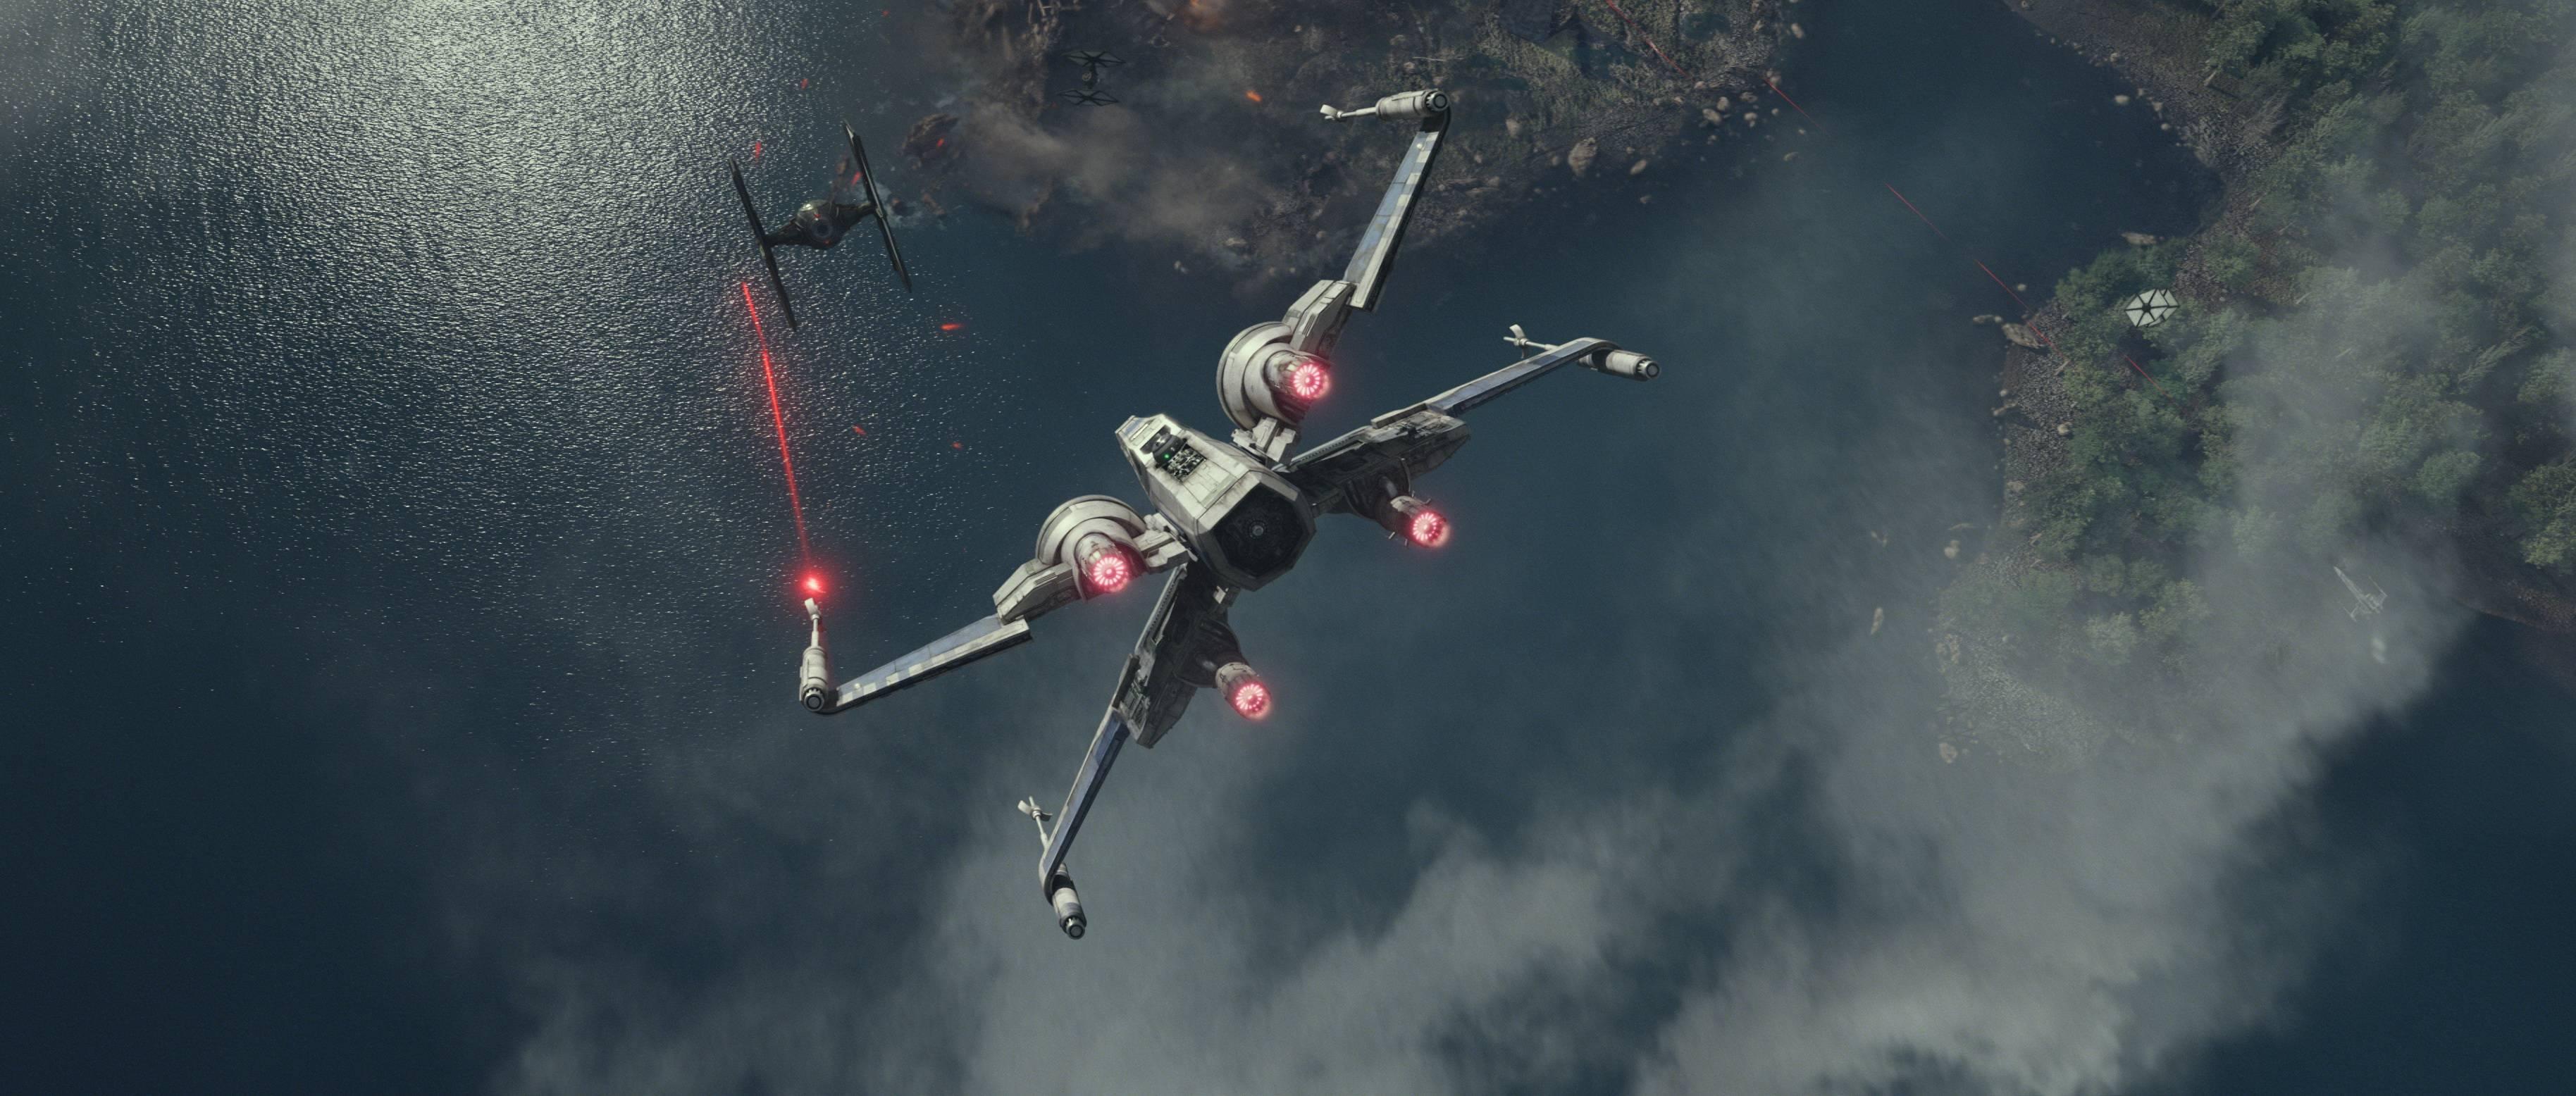 Star Wars The Force Awakens 8 3656x1556